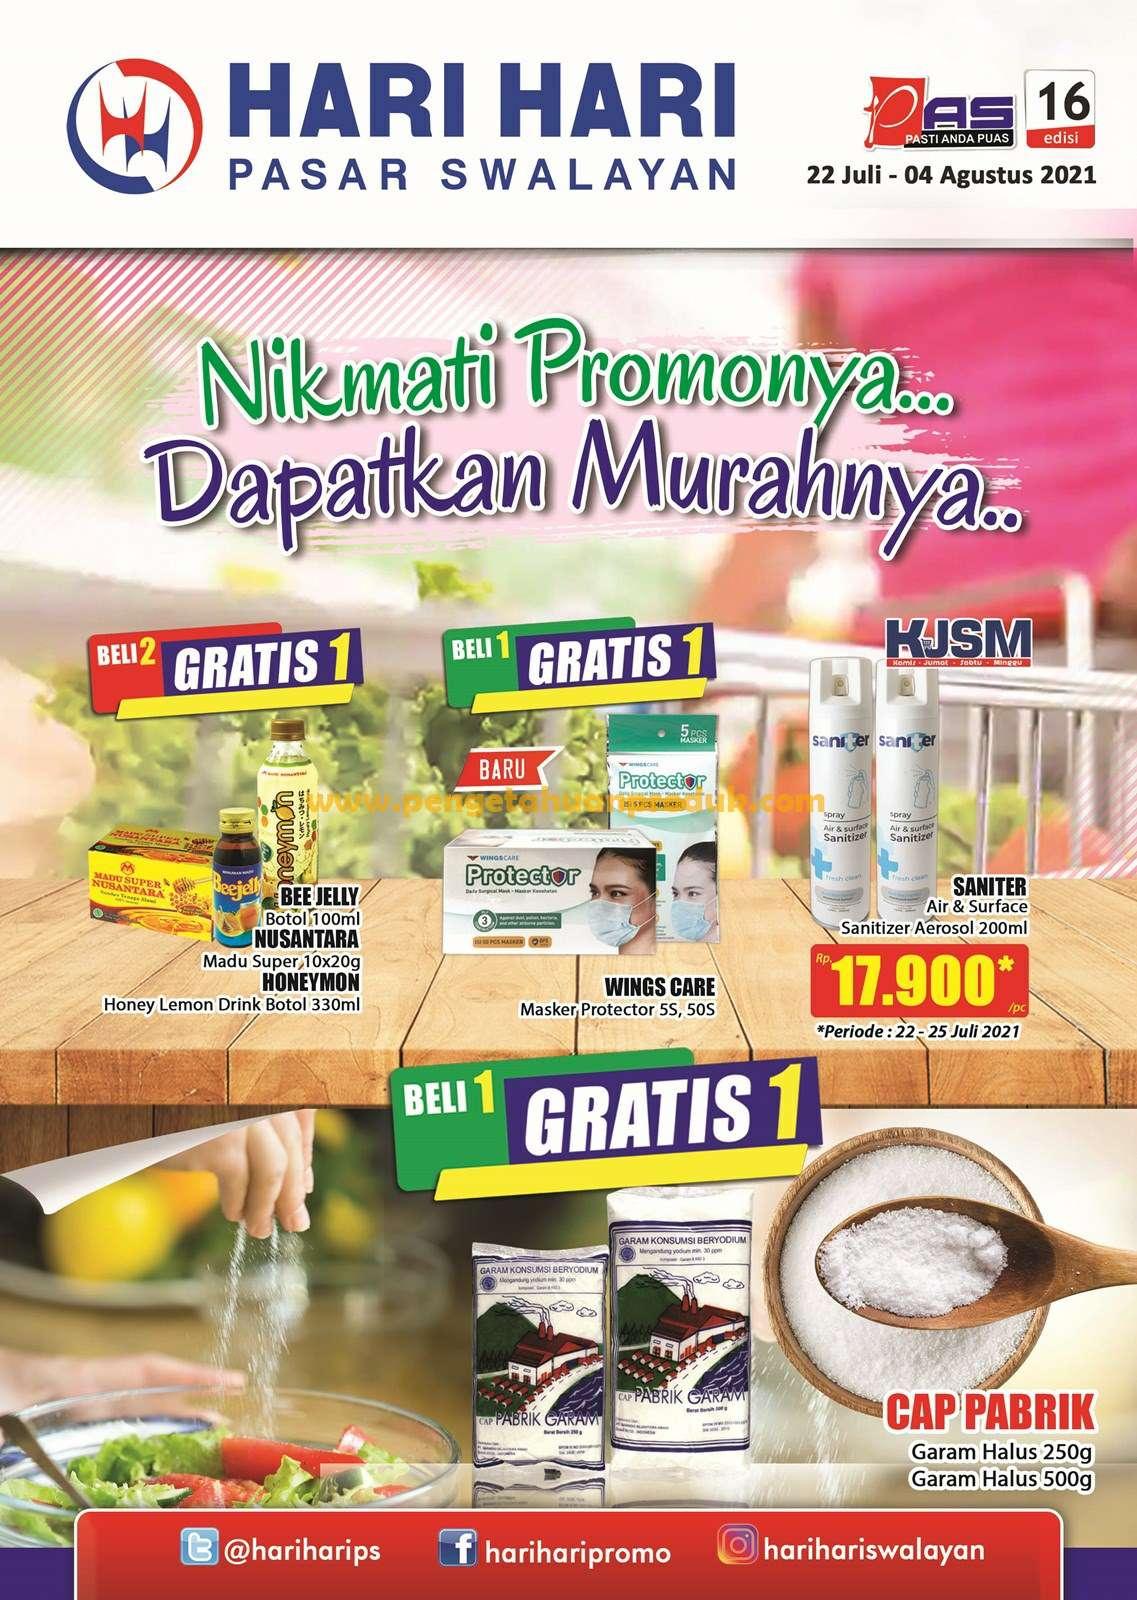 Katalog Promo Hari Hari Pasar Swalayan 22 Juli - 4 Agustus 2021